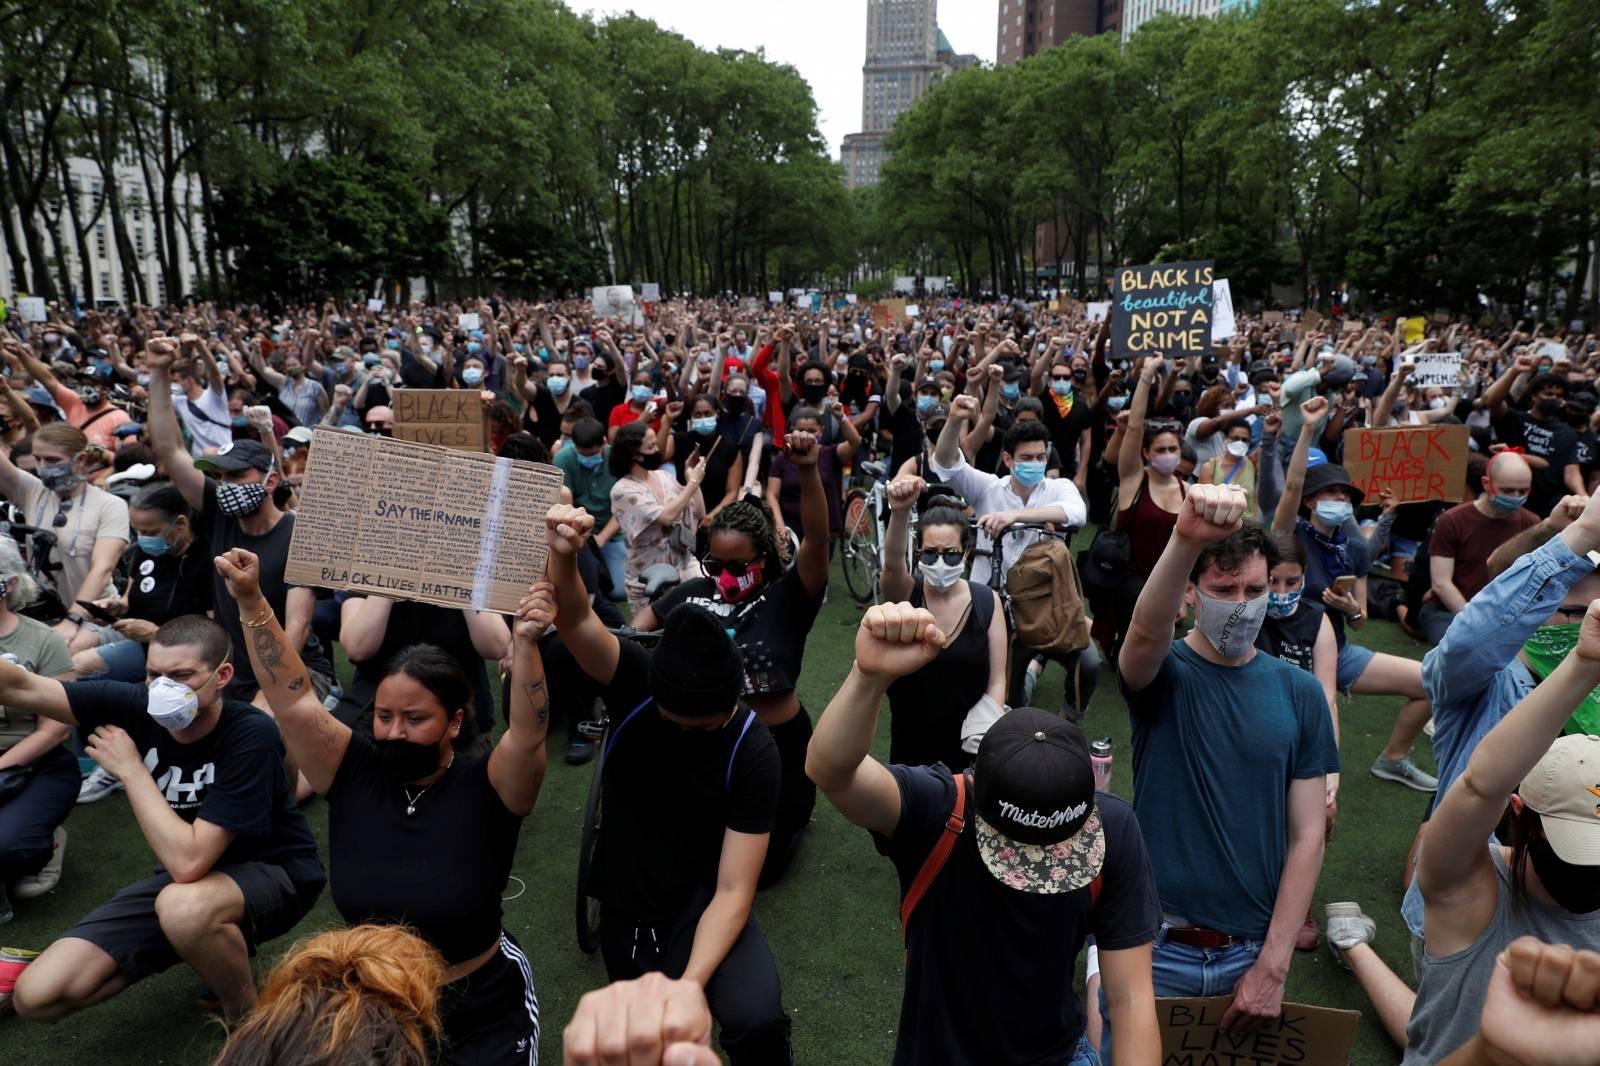 People attend public memorial after the death in Minneapolis police custody of George Floyd in Brooklyn New York